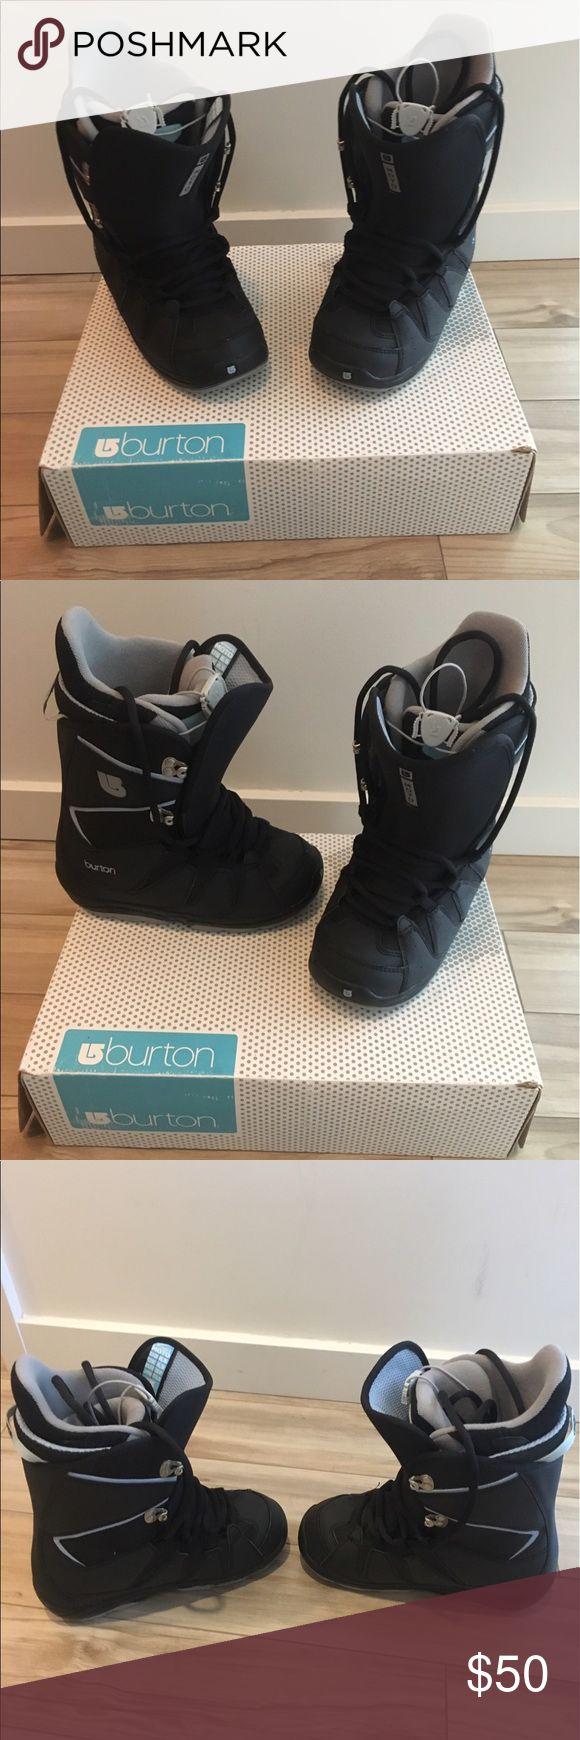 Burton Snowboard Boots Brand new woman's snowboard boots by Burton. Never worn. Burton Shoes Winter & Rain Boots